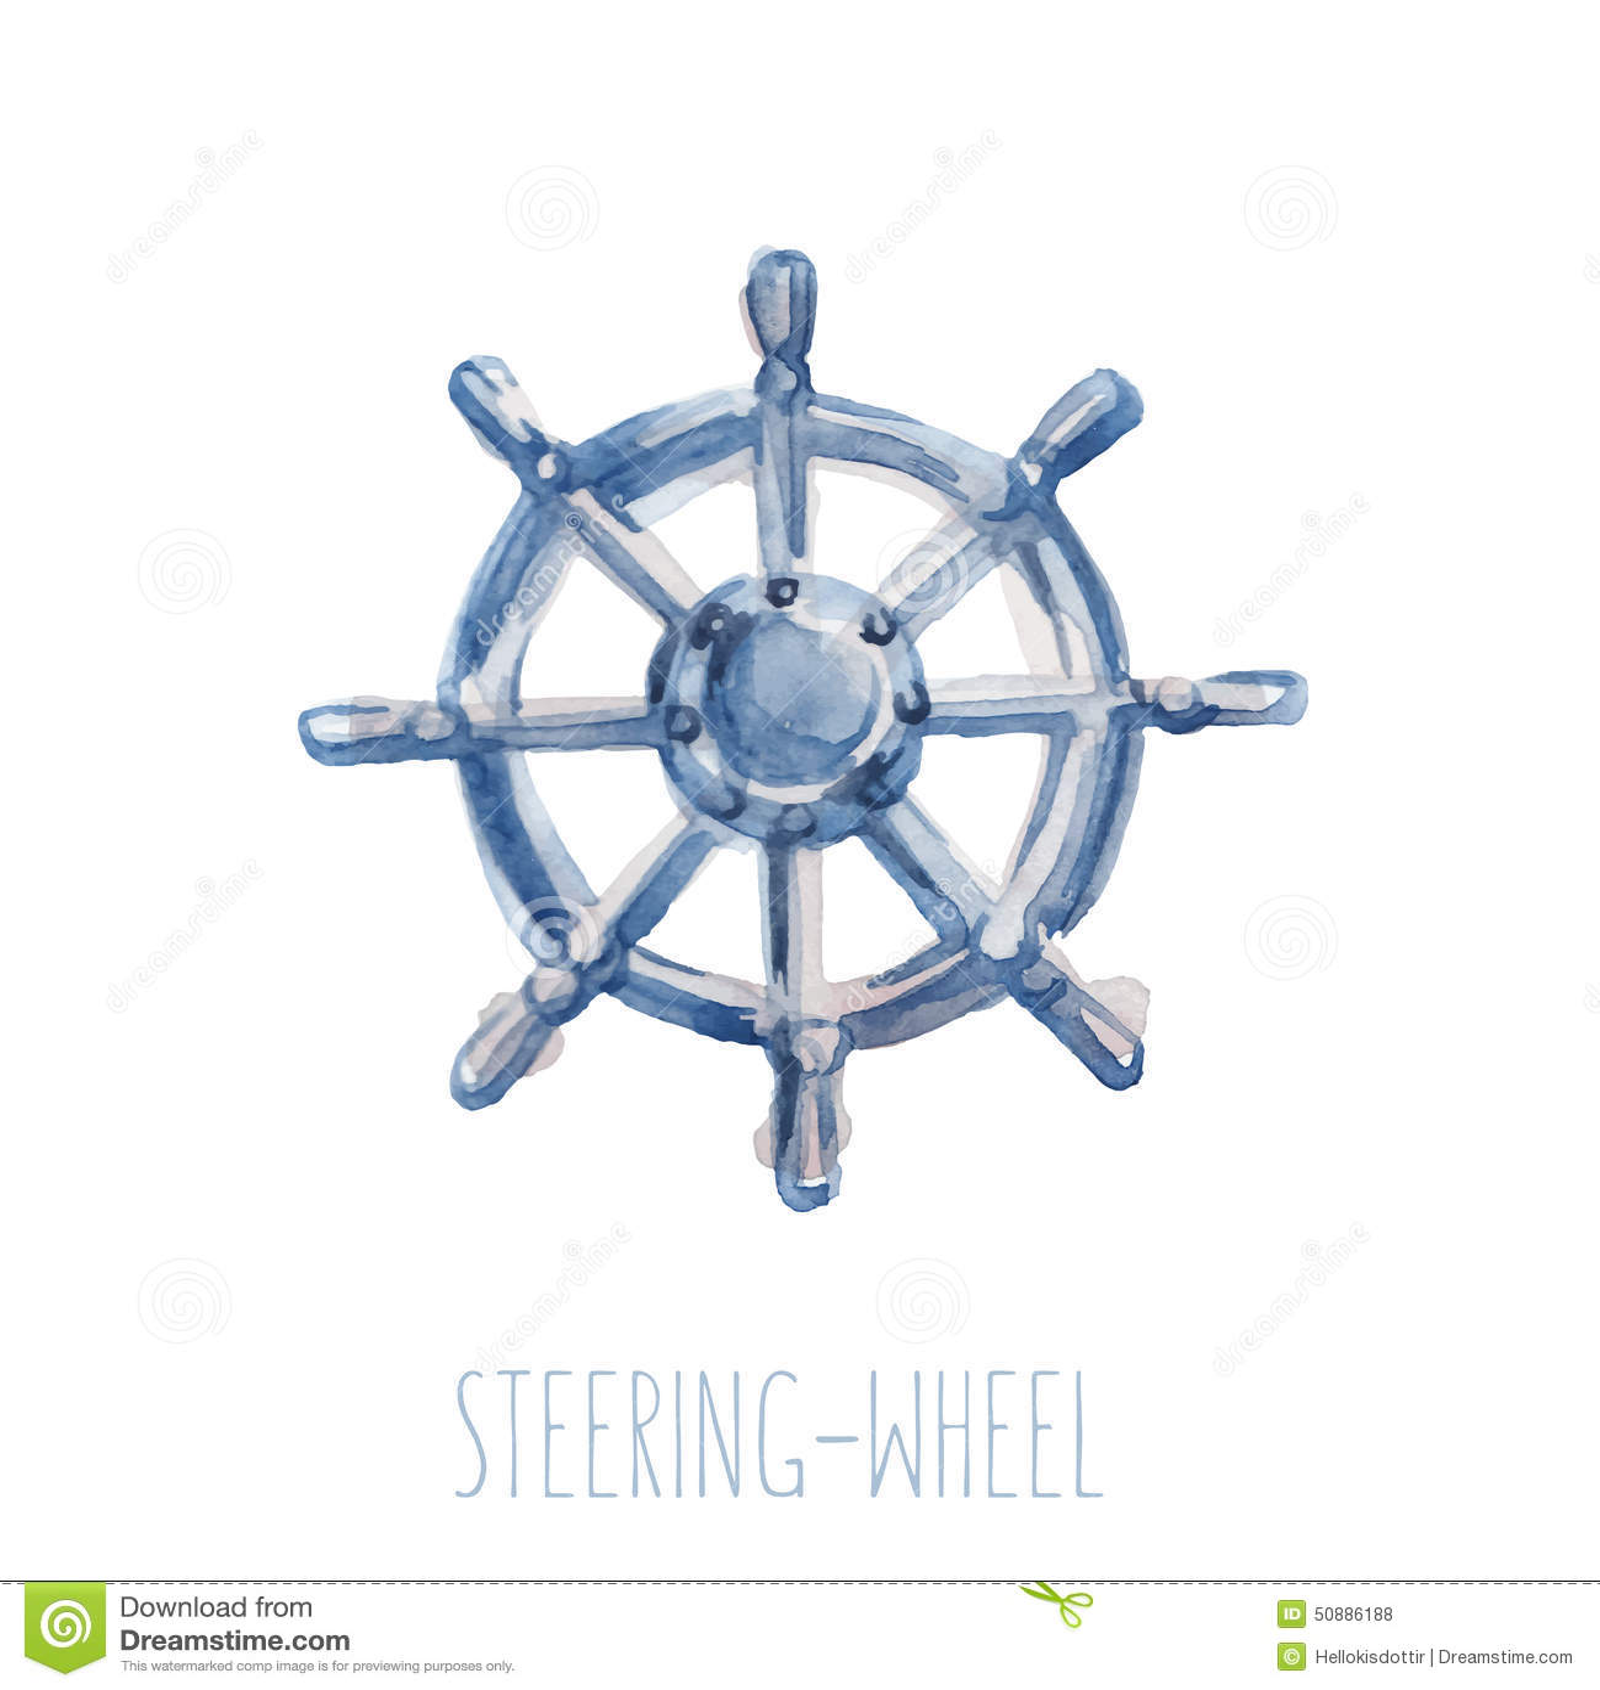 Watercolor Steering-wheel Stock Vector - Image: 50886188